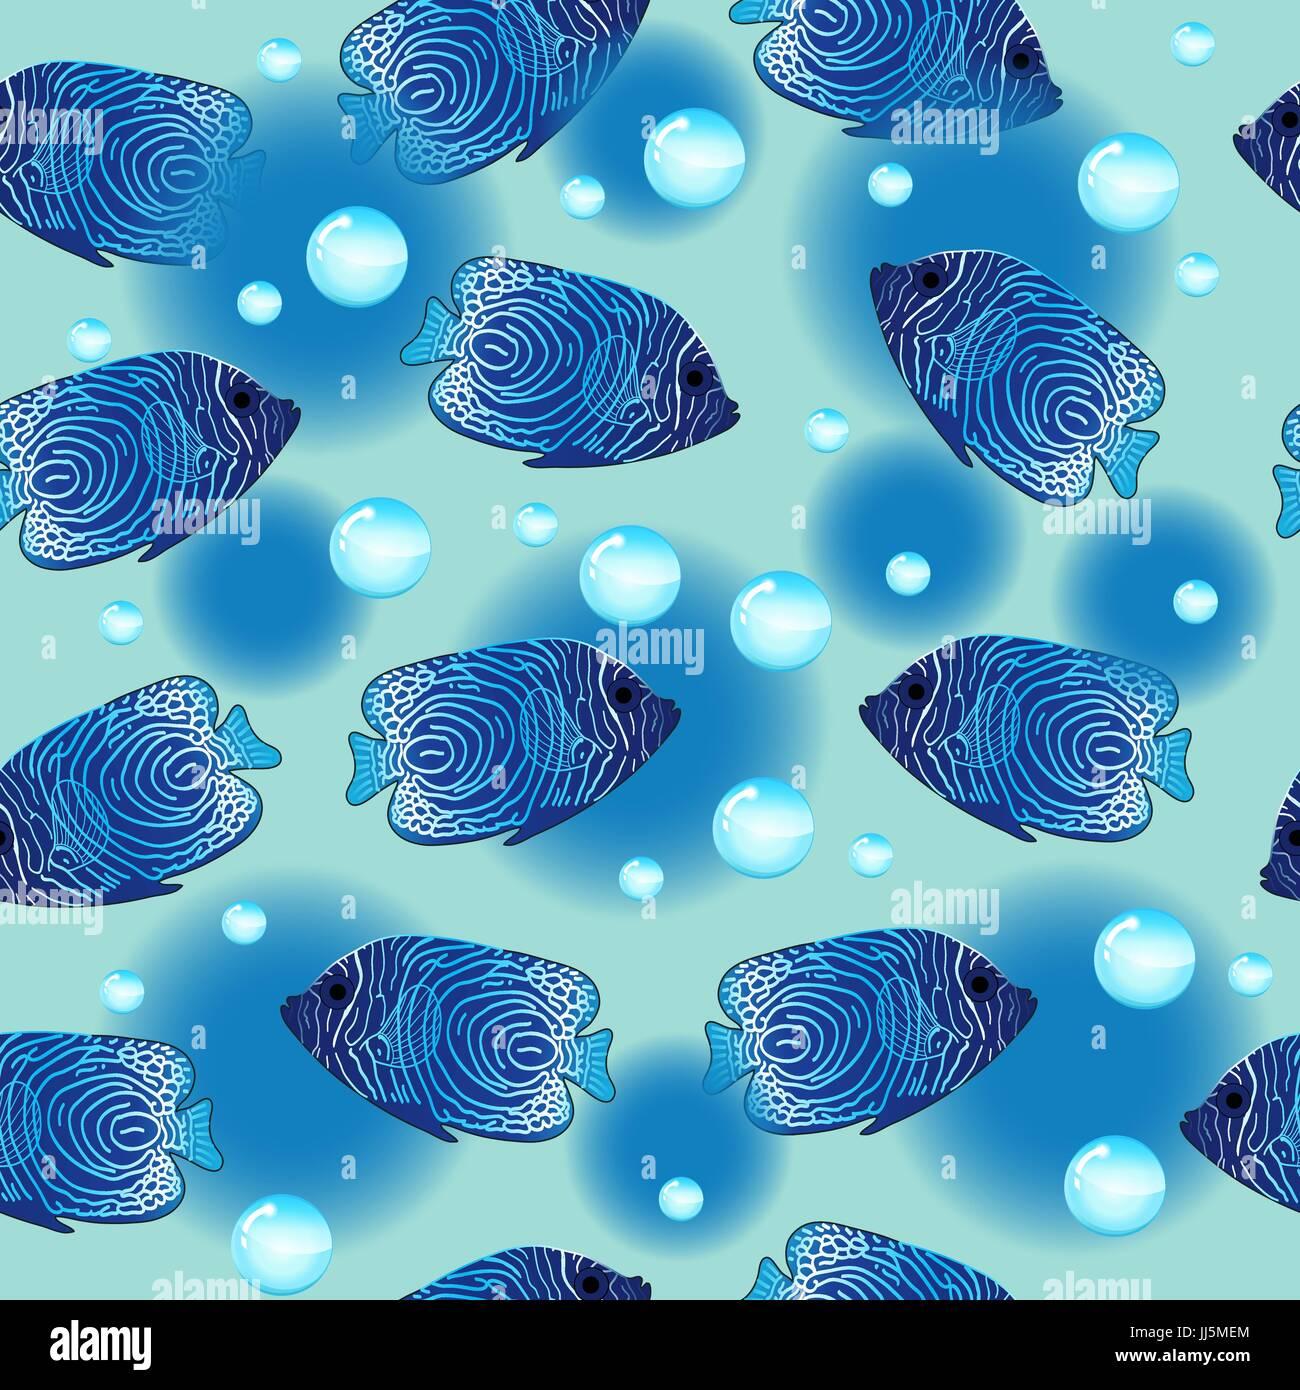 Seamless underwater texture Pool Plan Aquarium With Fish Seamless Pattern Underwater Infinite Texture Marine Repeating Background Alamy Aquarium With Fish Seamless Pattern Underwater Infinite Texture